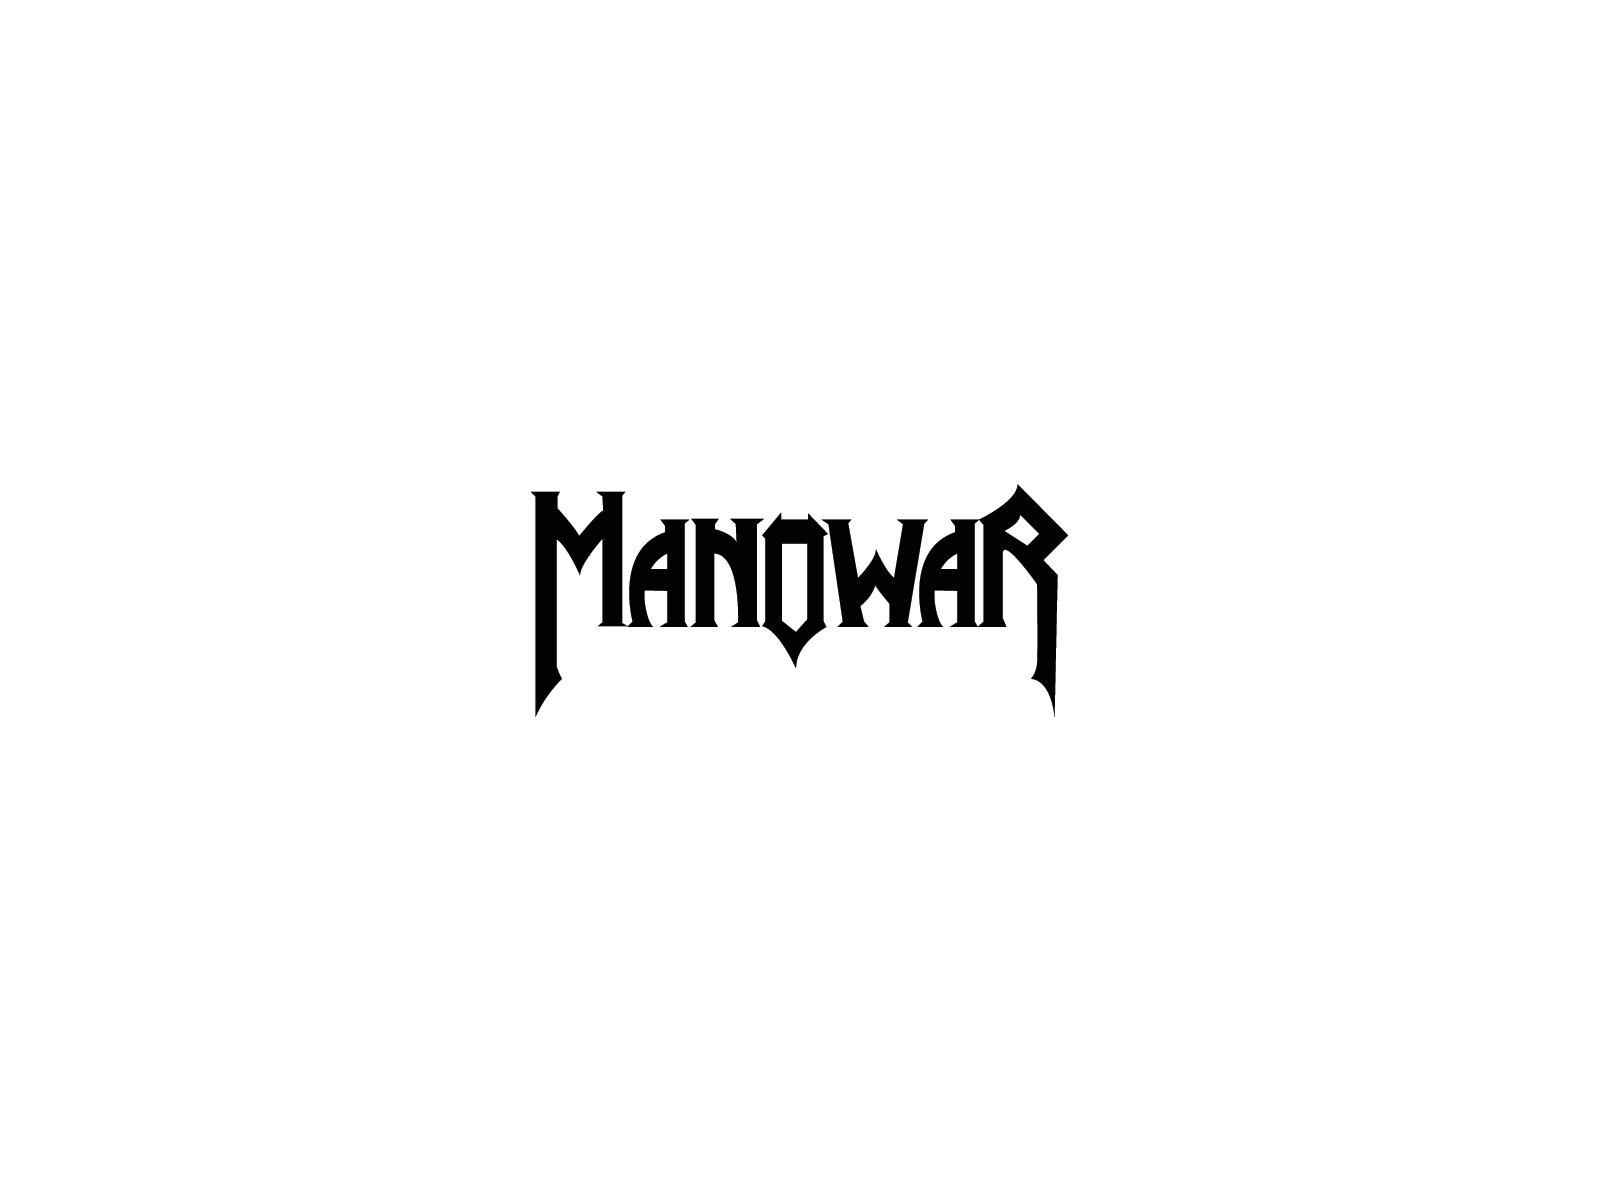 The animals band logo scorpions band logo - Manowar Logo And Wallpaper Band Logoslogo Design